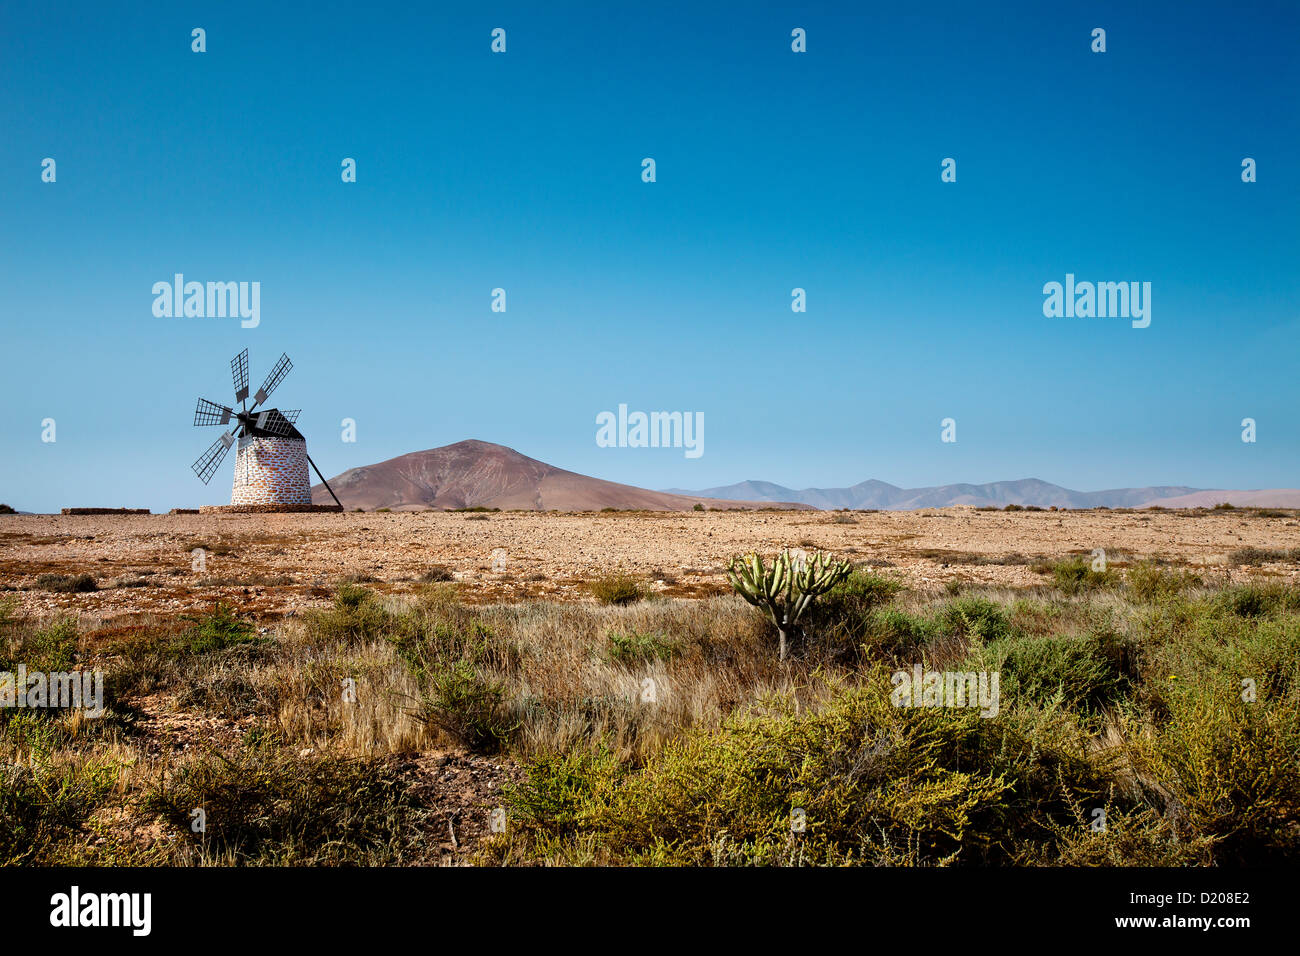 Windmühle Molino de Tefia, Tefia, Fuerteventura, Kanarische Inseln, Spanien Stockbild